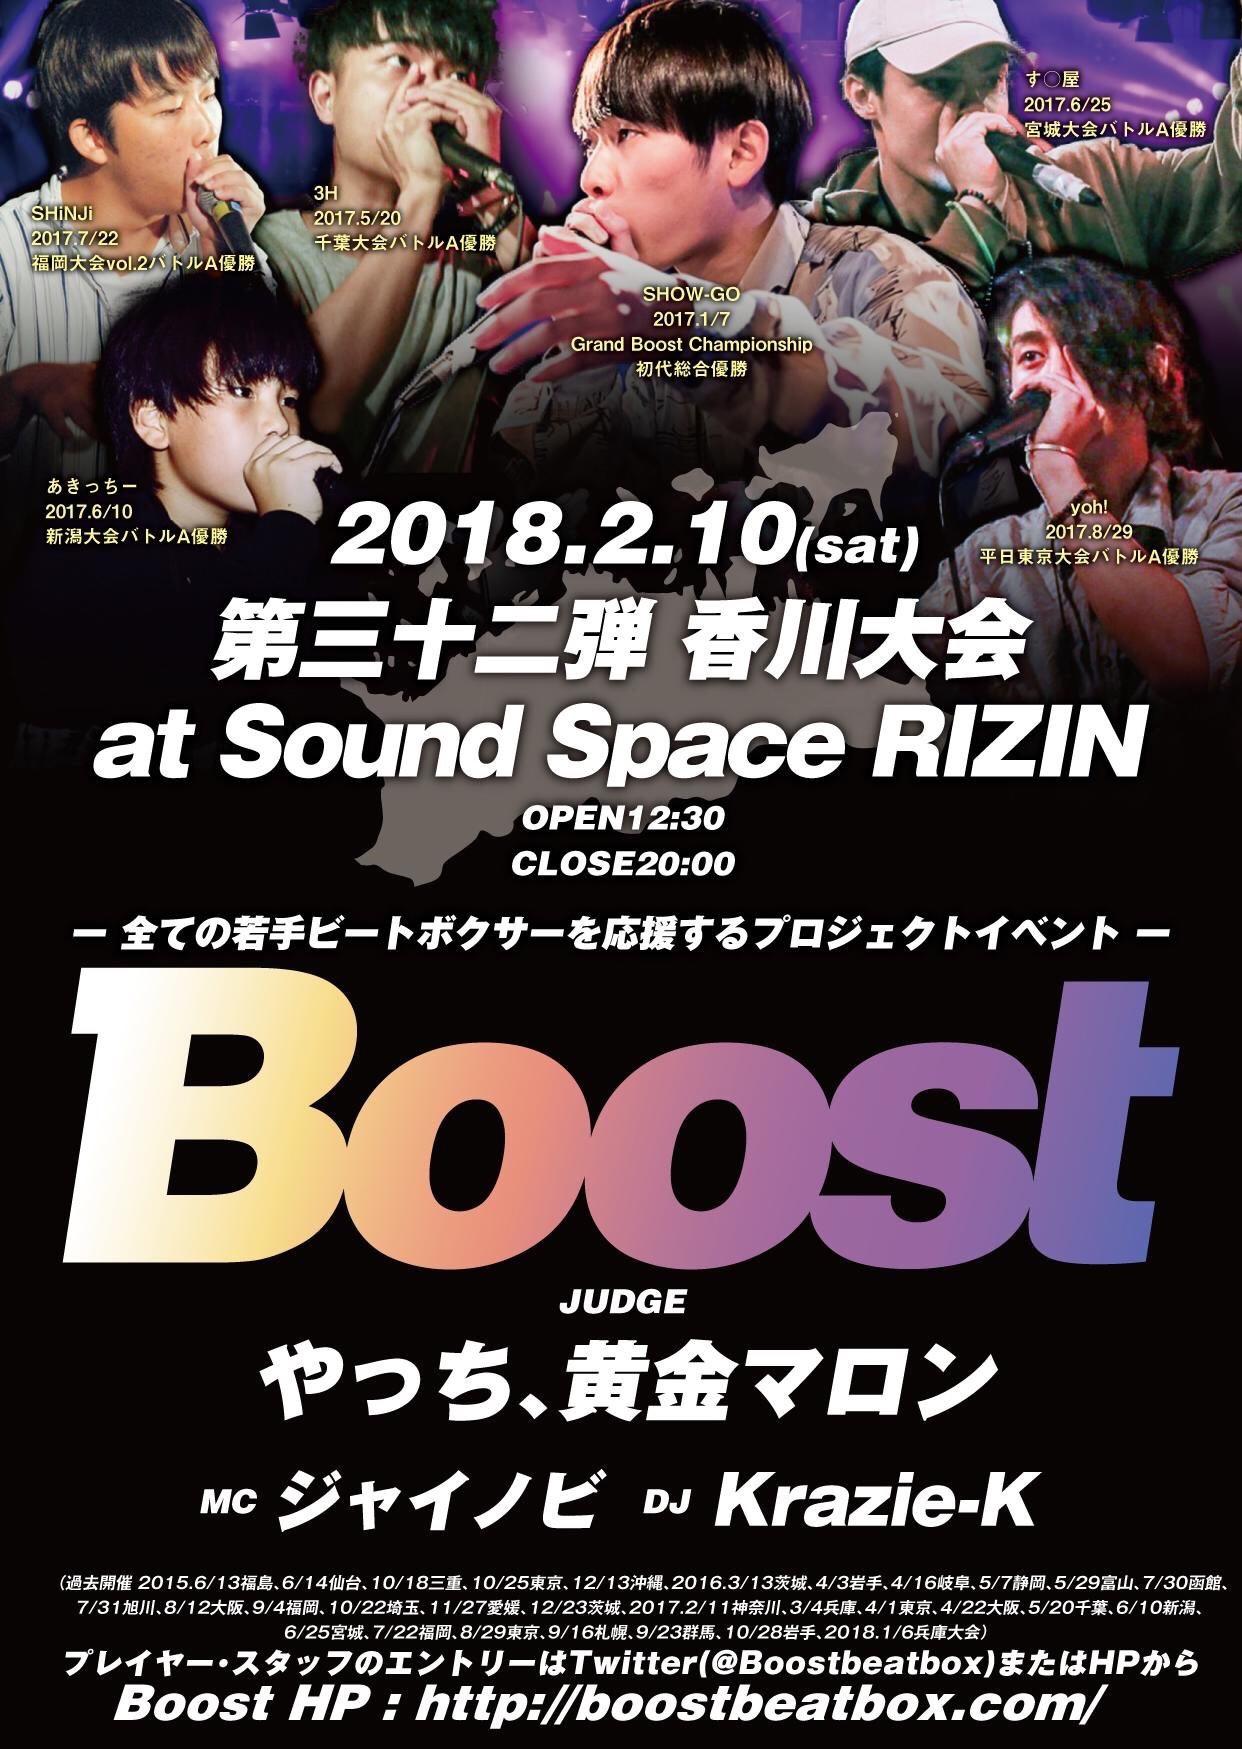 Boost香川大会の開催が決定!